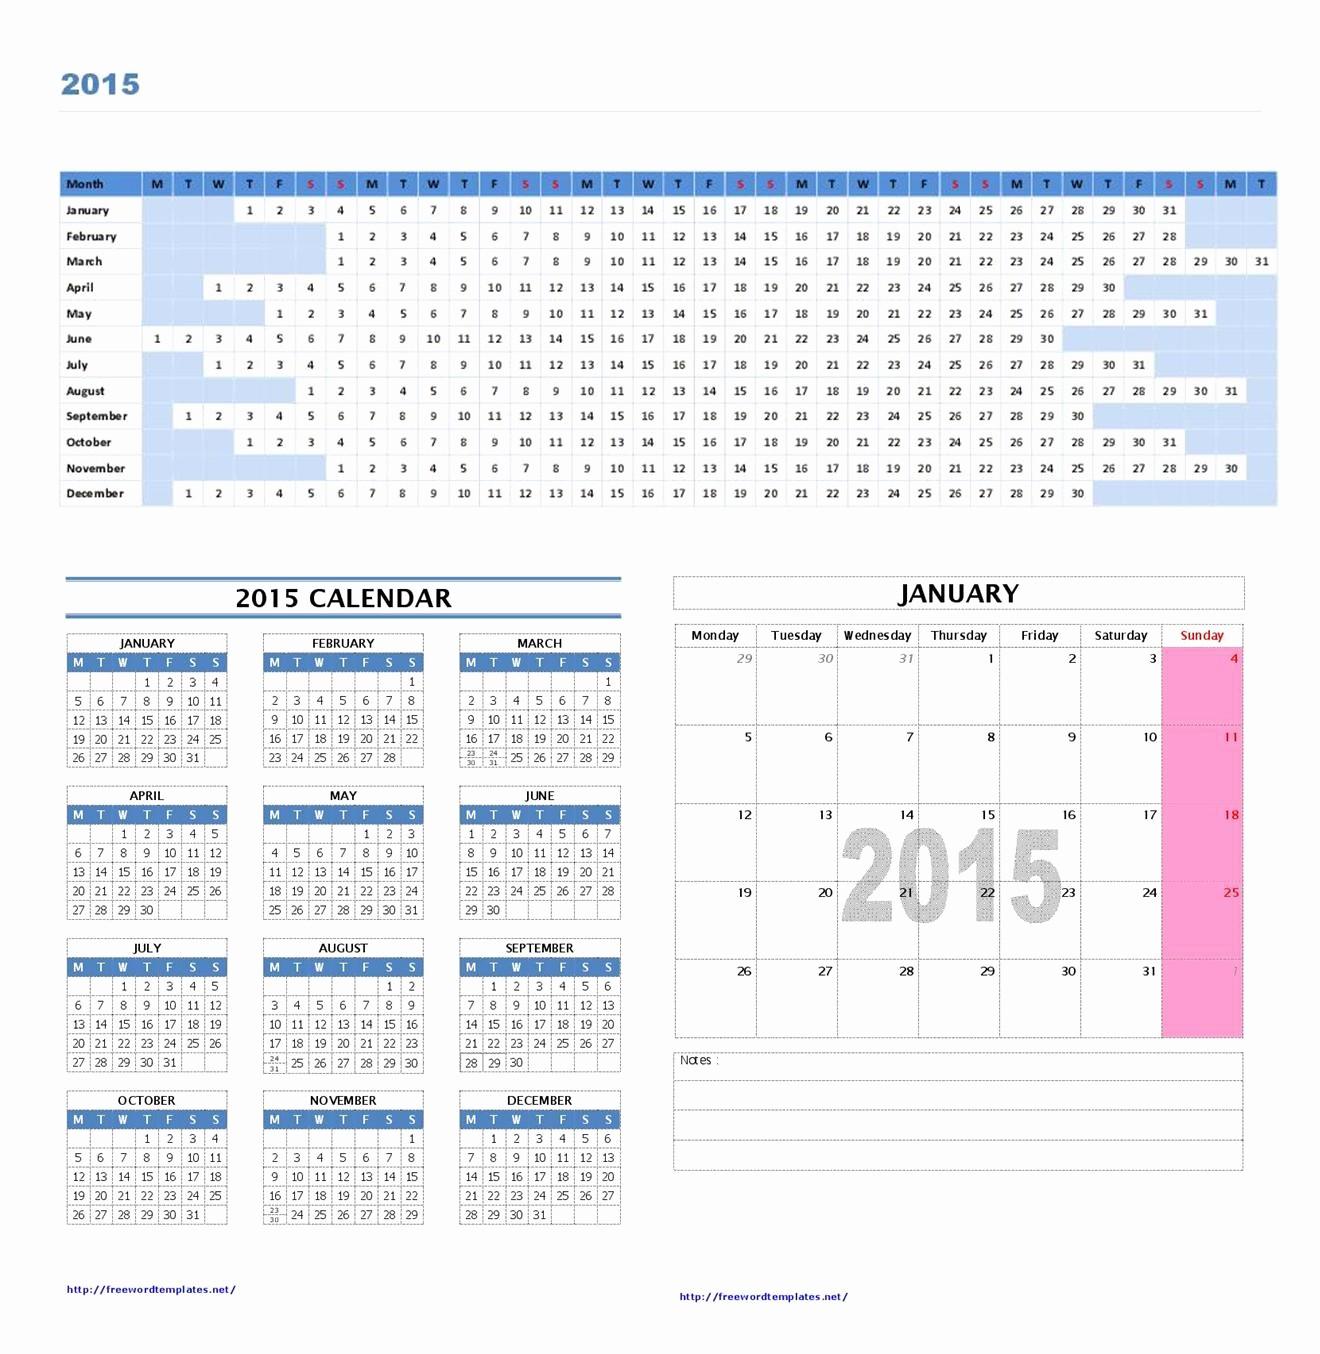 December 2015 Calendar Word Document Lovely 16 2015 Word Calendar Template 2015 Monthly